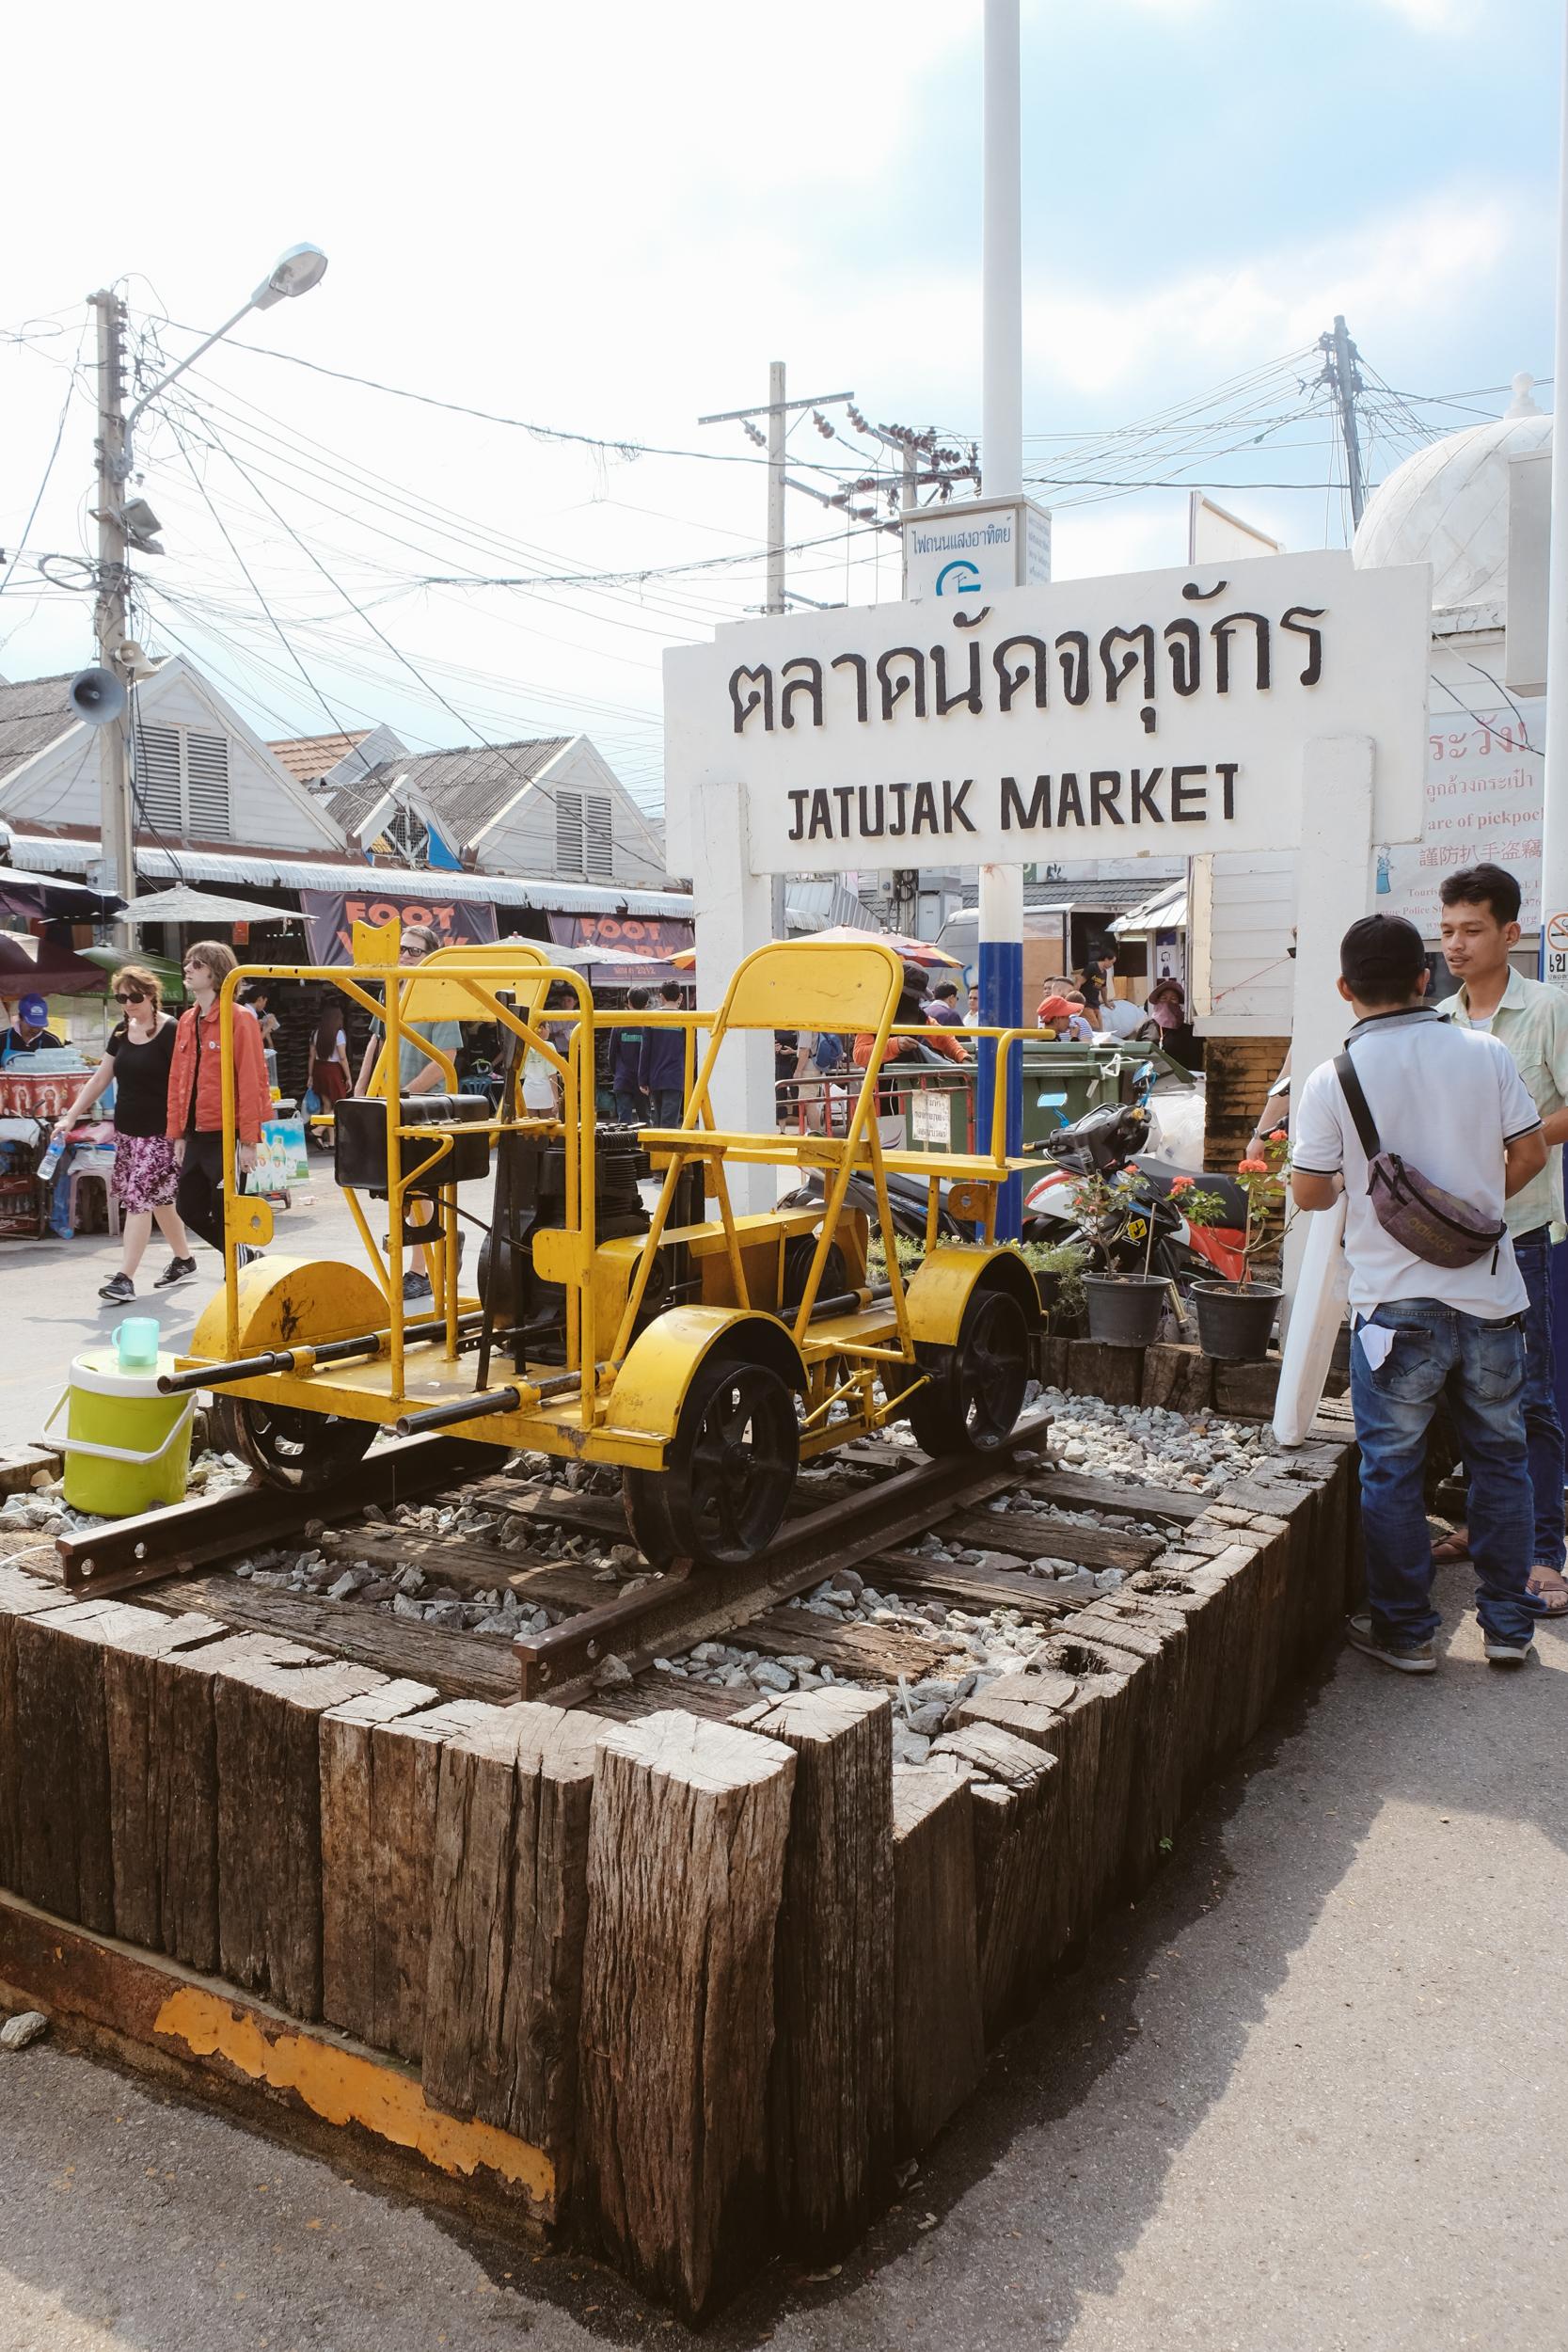 Jatujak Market, the largest market in all of Thailand!